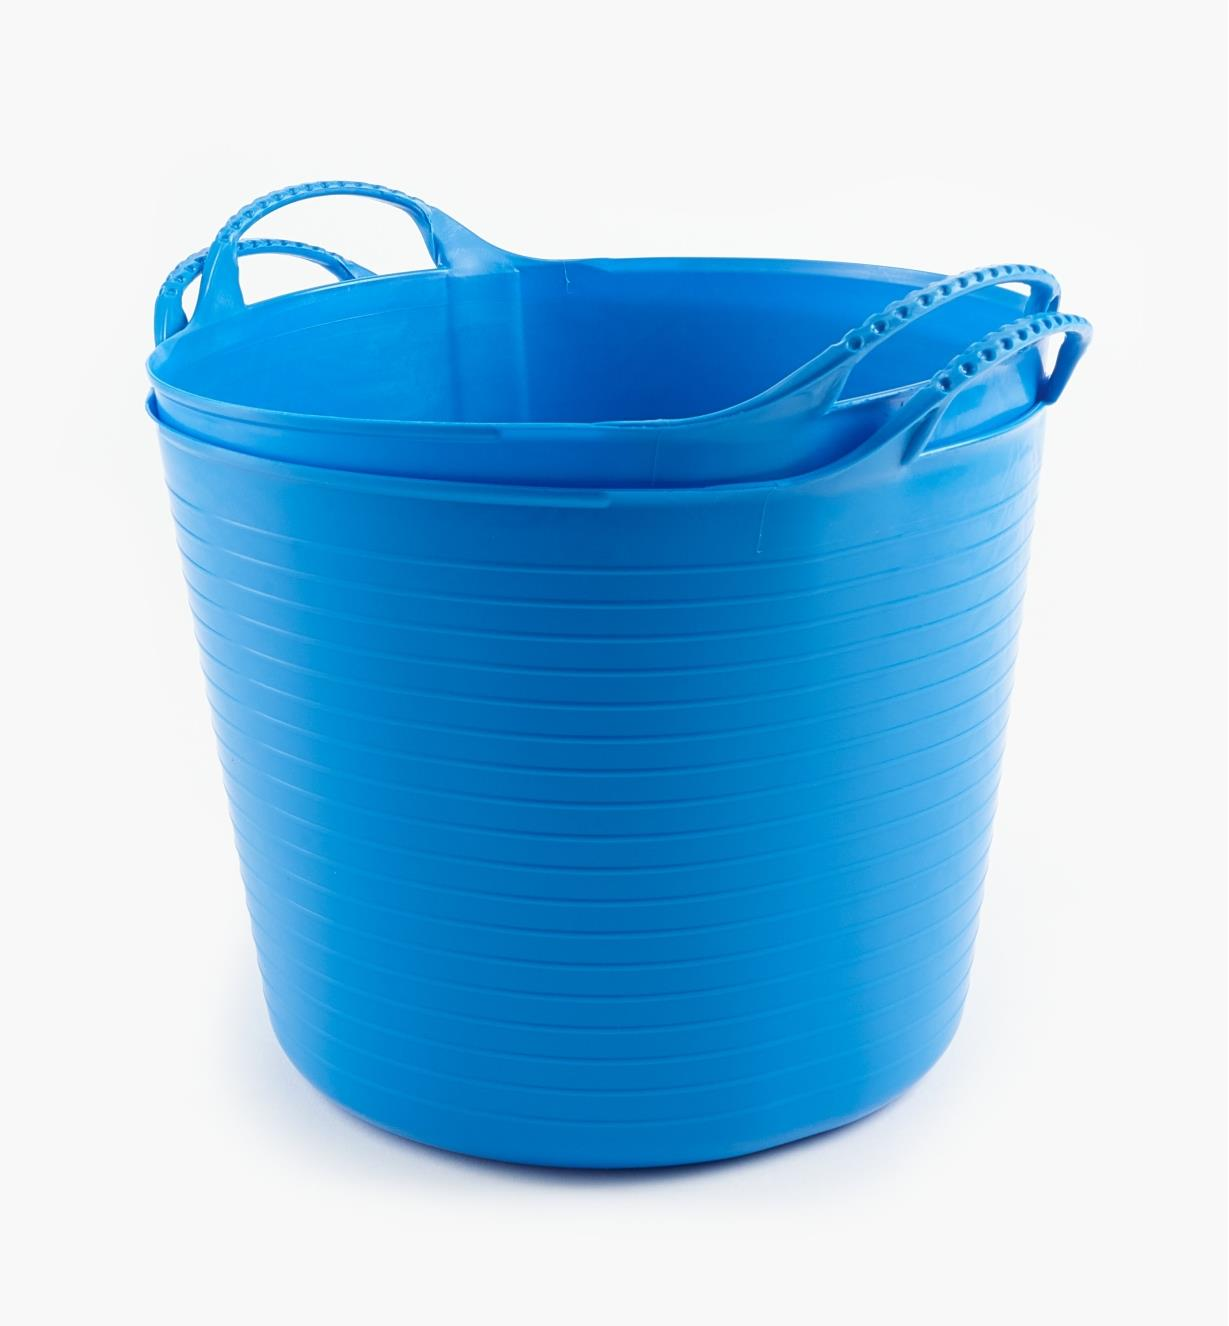 WT633 - 14l Blue Tubs, pair